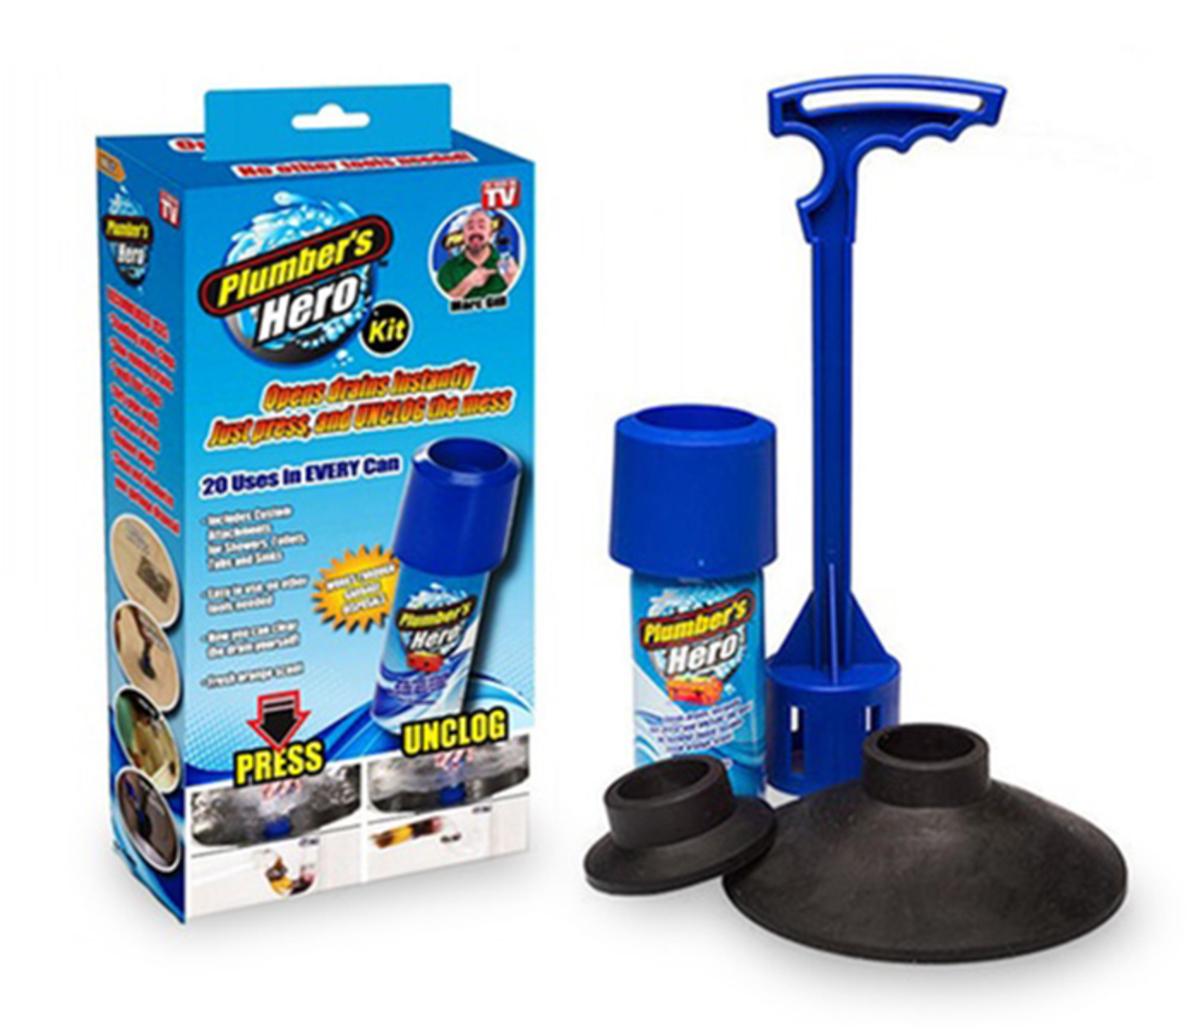 Plumber's Hero Kit - Unclog Drains Instantly